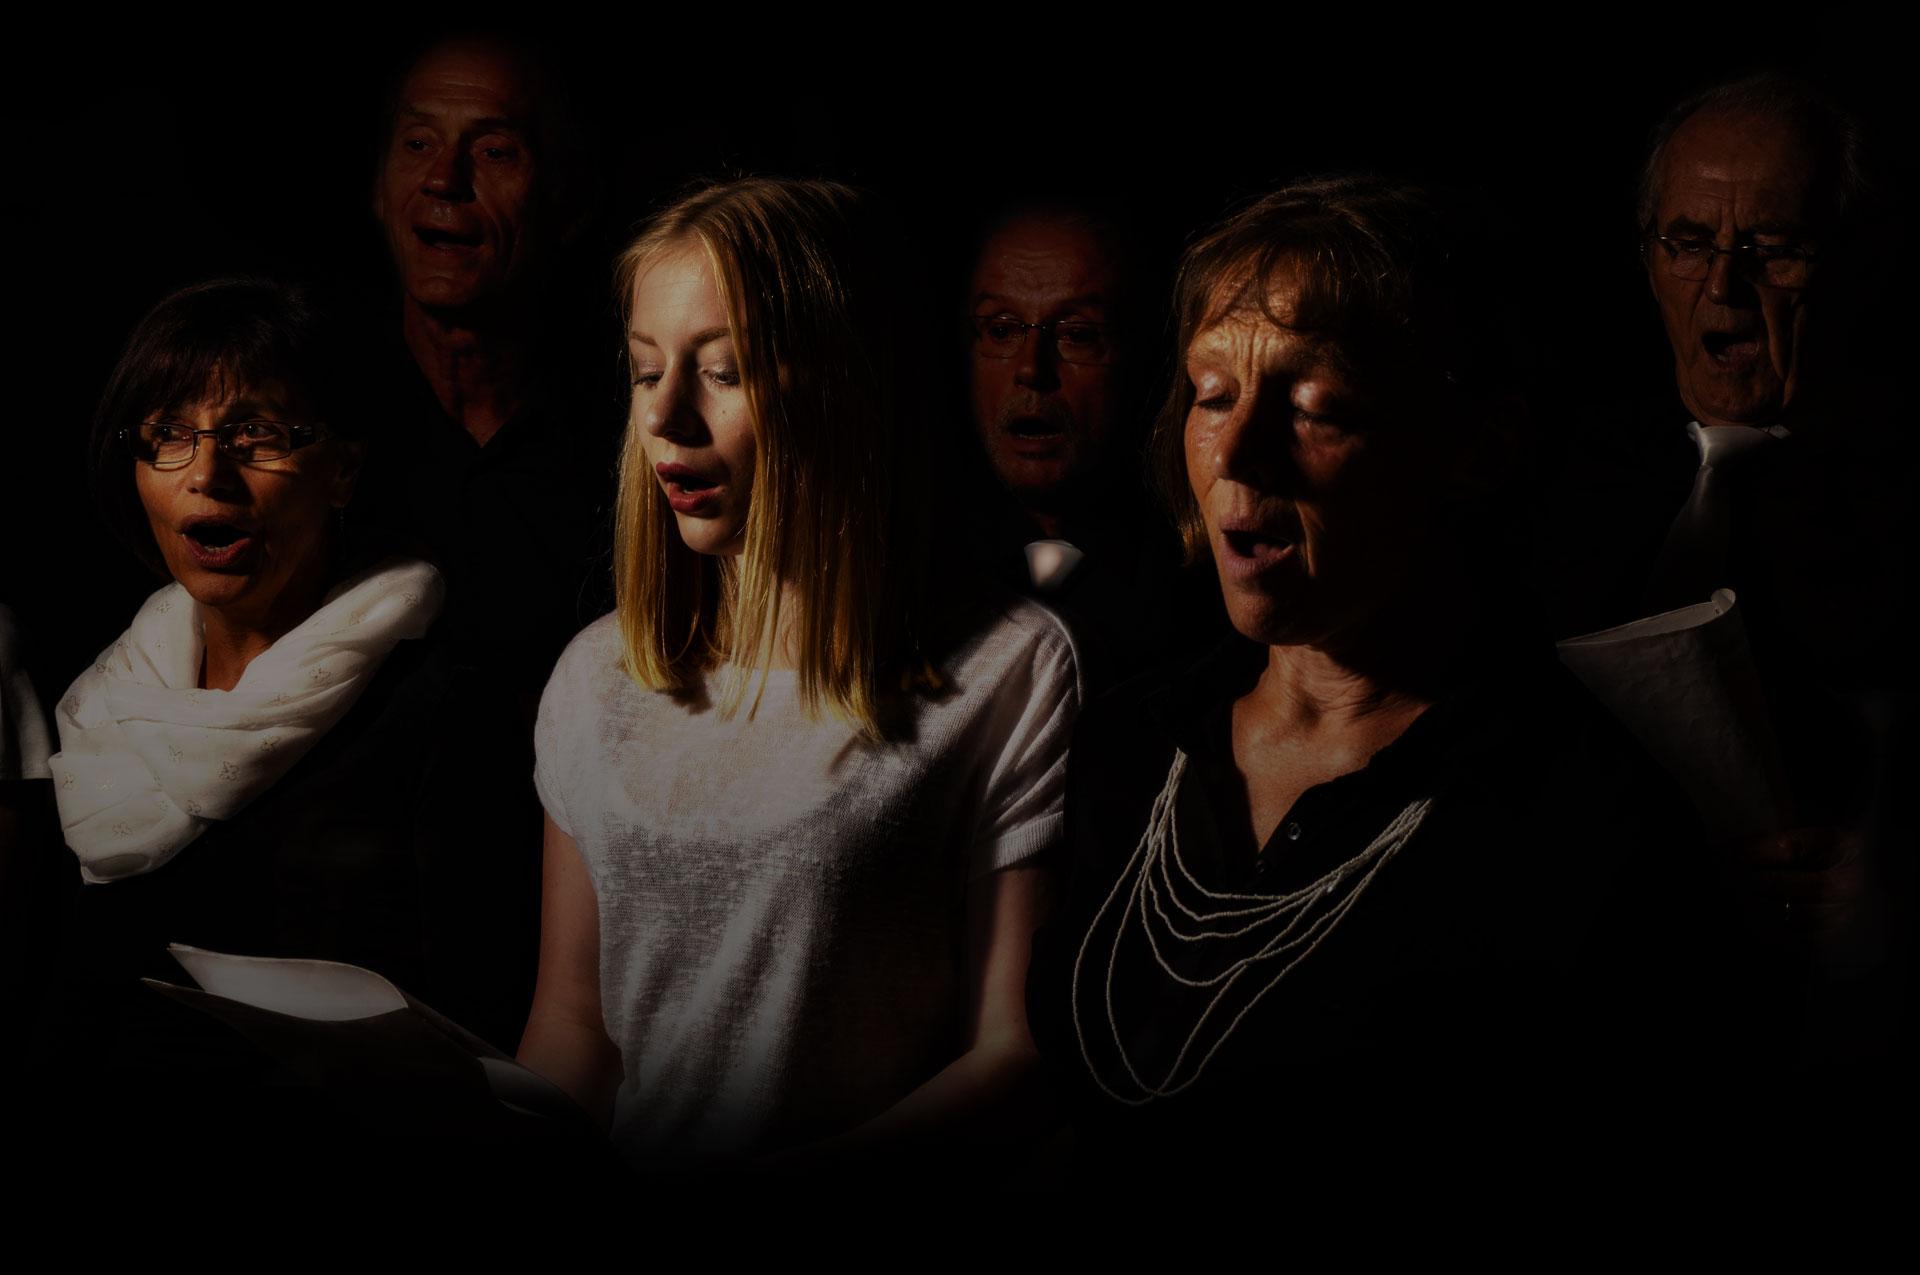 KlippenKlang singender Chor 1